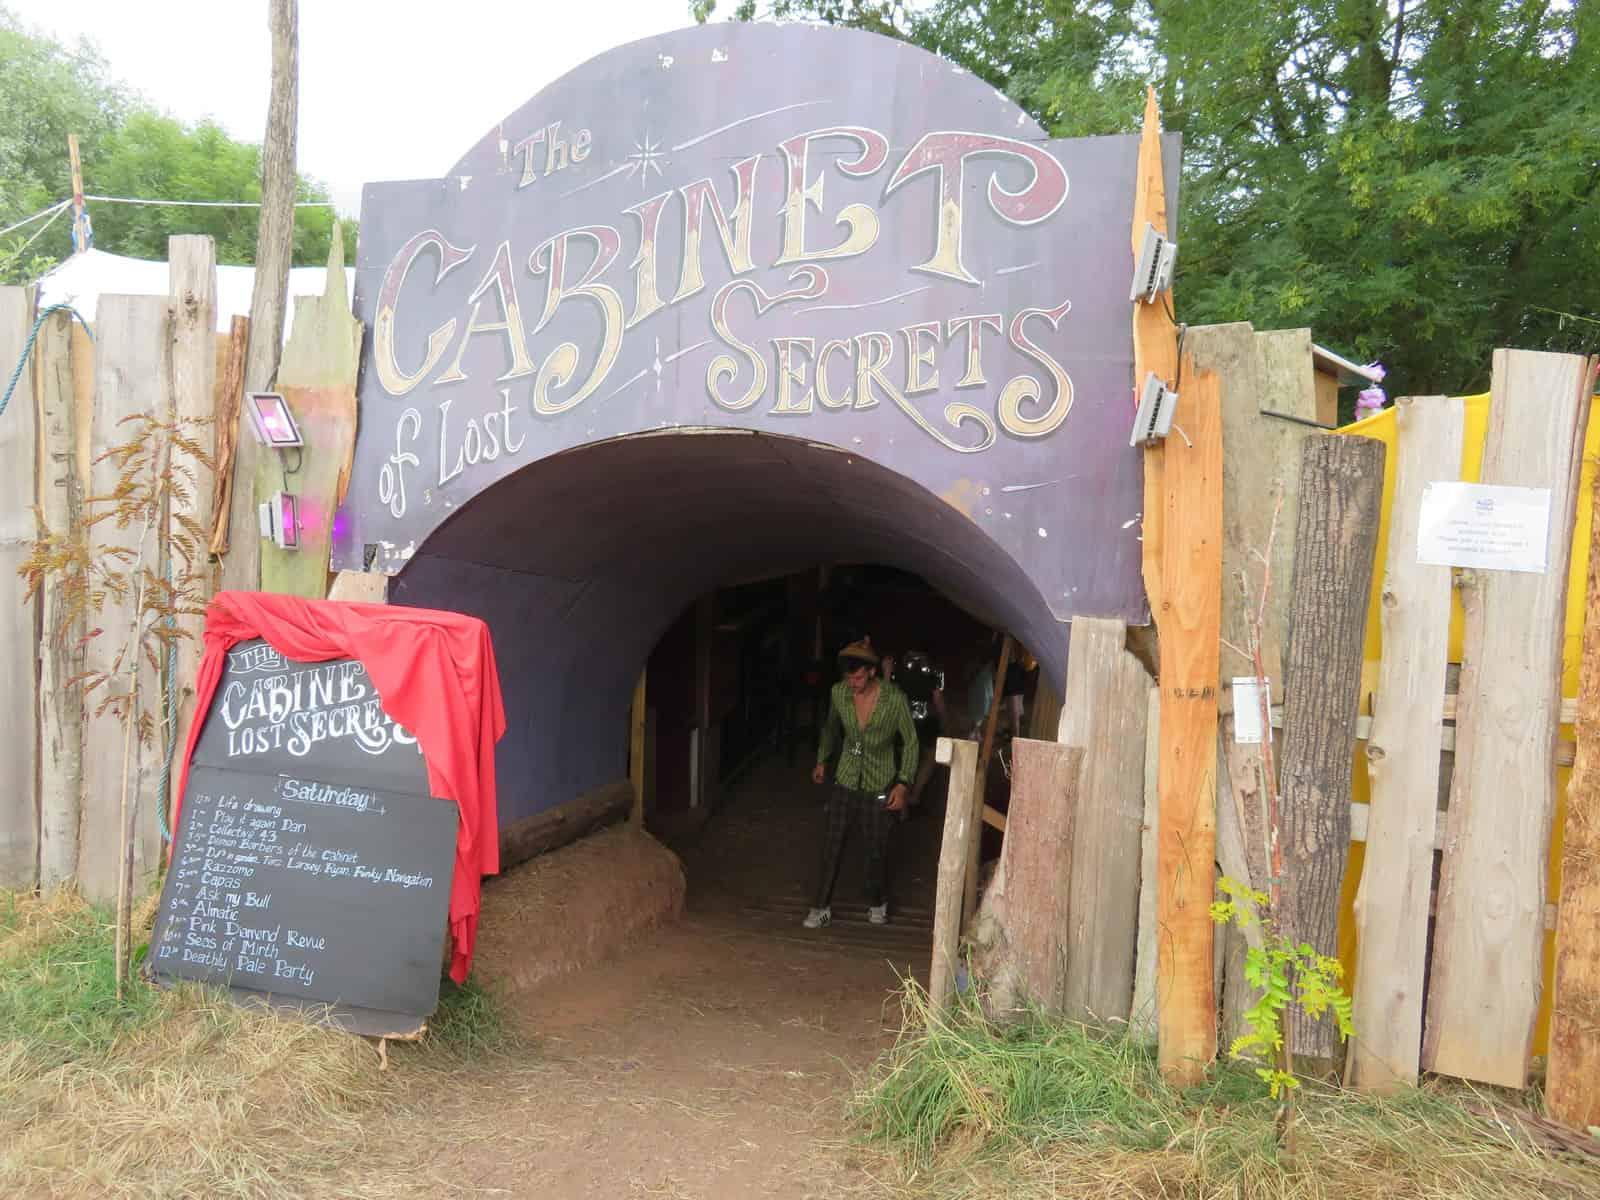 Nozstock the hidden valley festival - cabinet of secrets